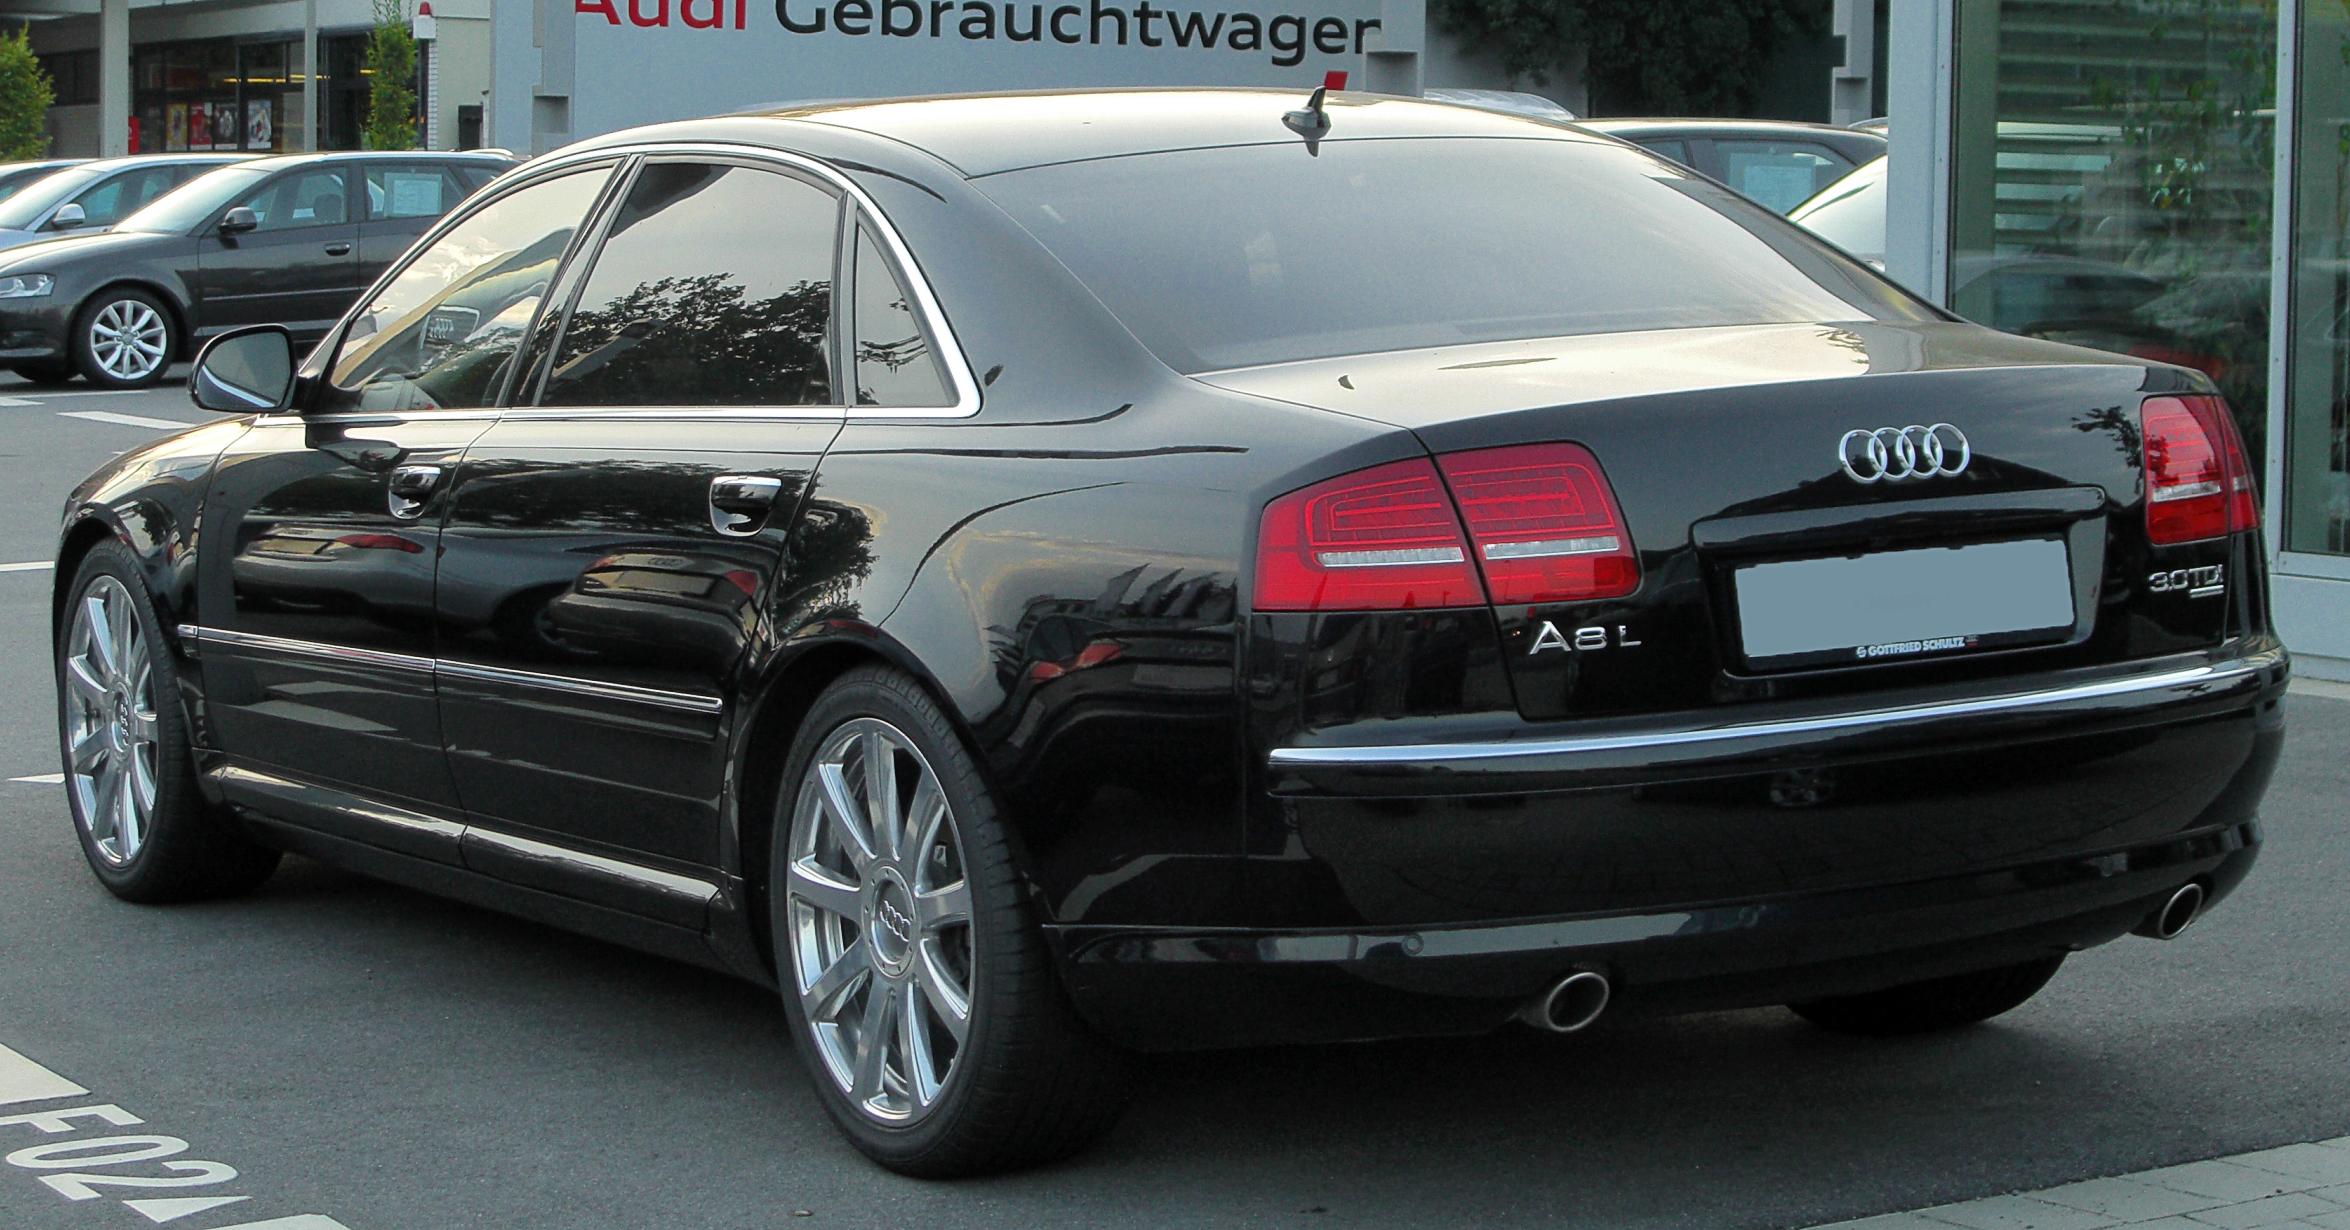 Audi A8 3.0 TDI quattro technical details, history, photos on Better Parts LTD